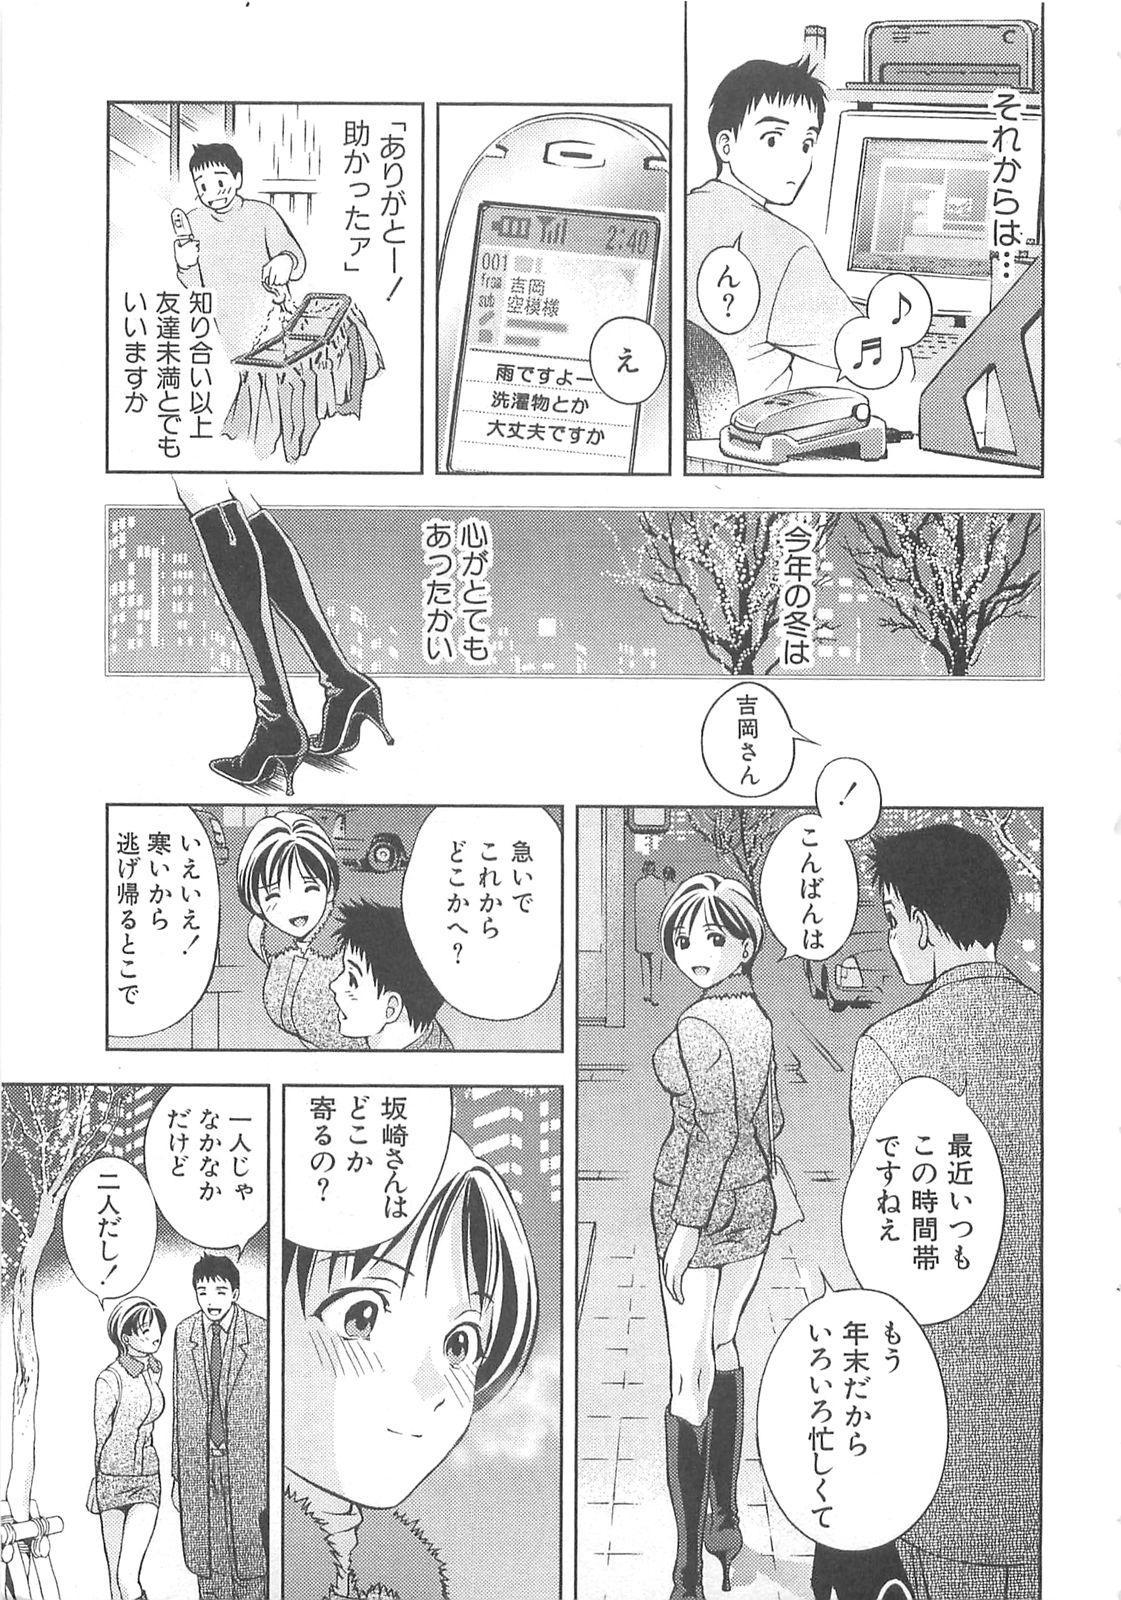 Tenshi no Kyuu - Angel's Pretty Hip 33